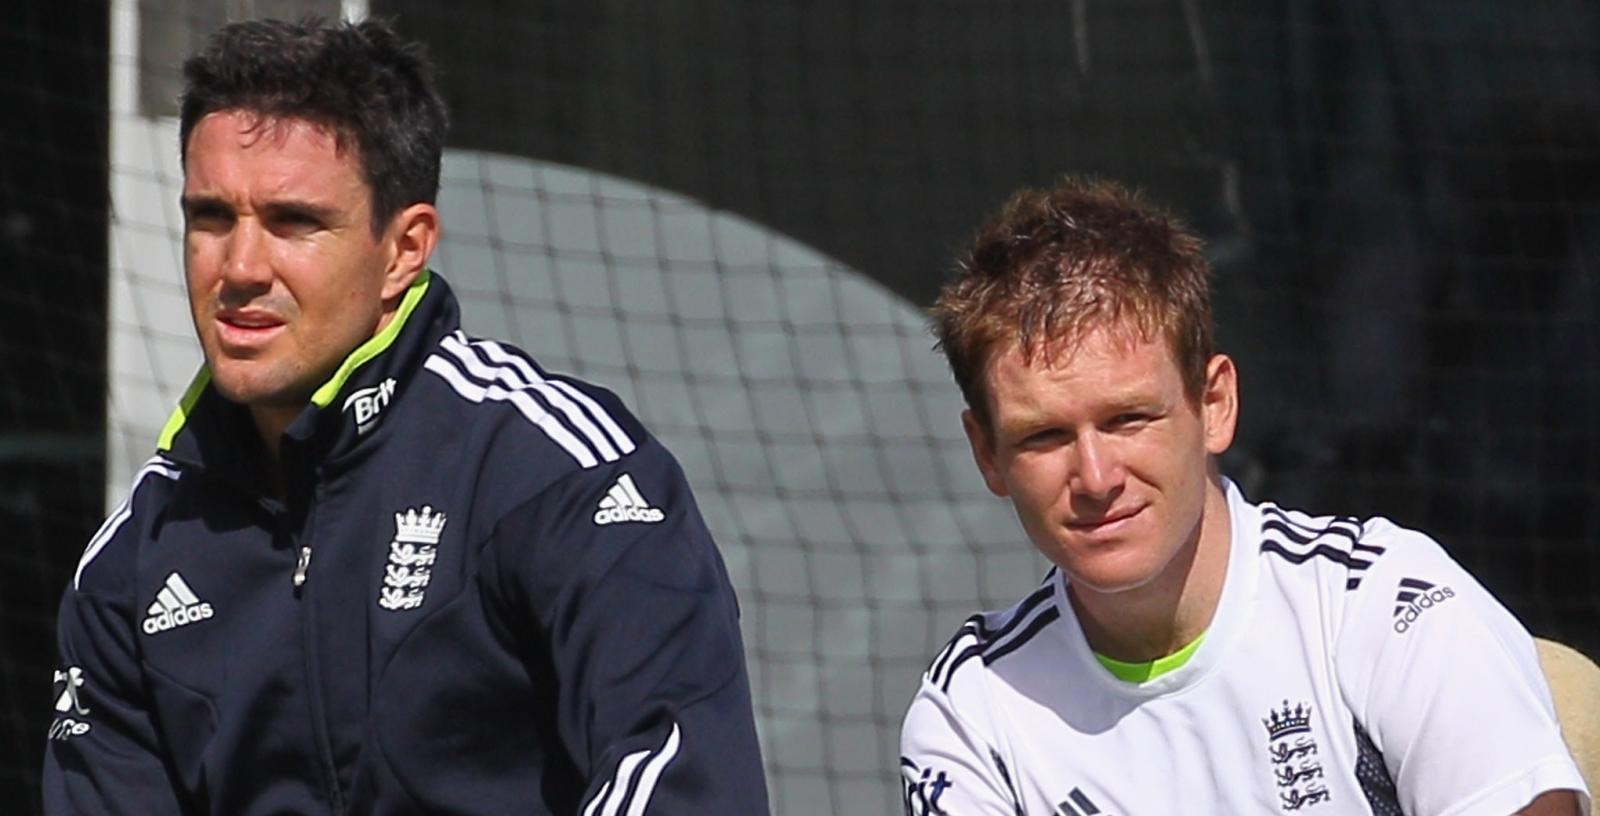 Kevin Pietersen and Eoin Morgan